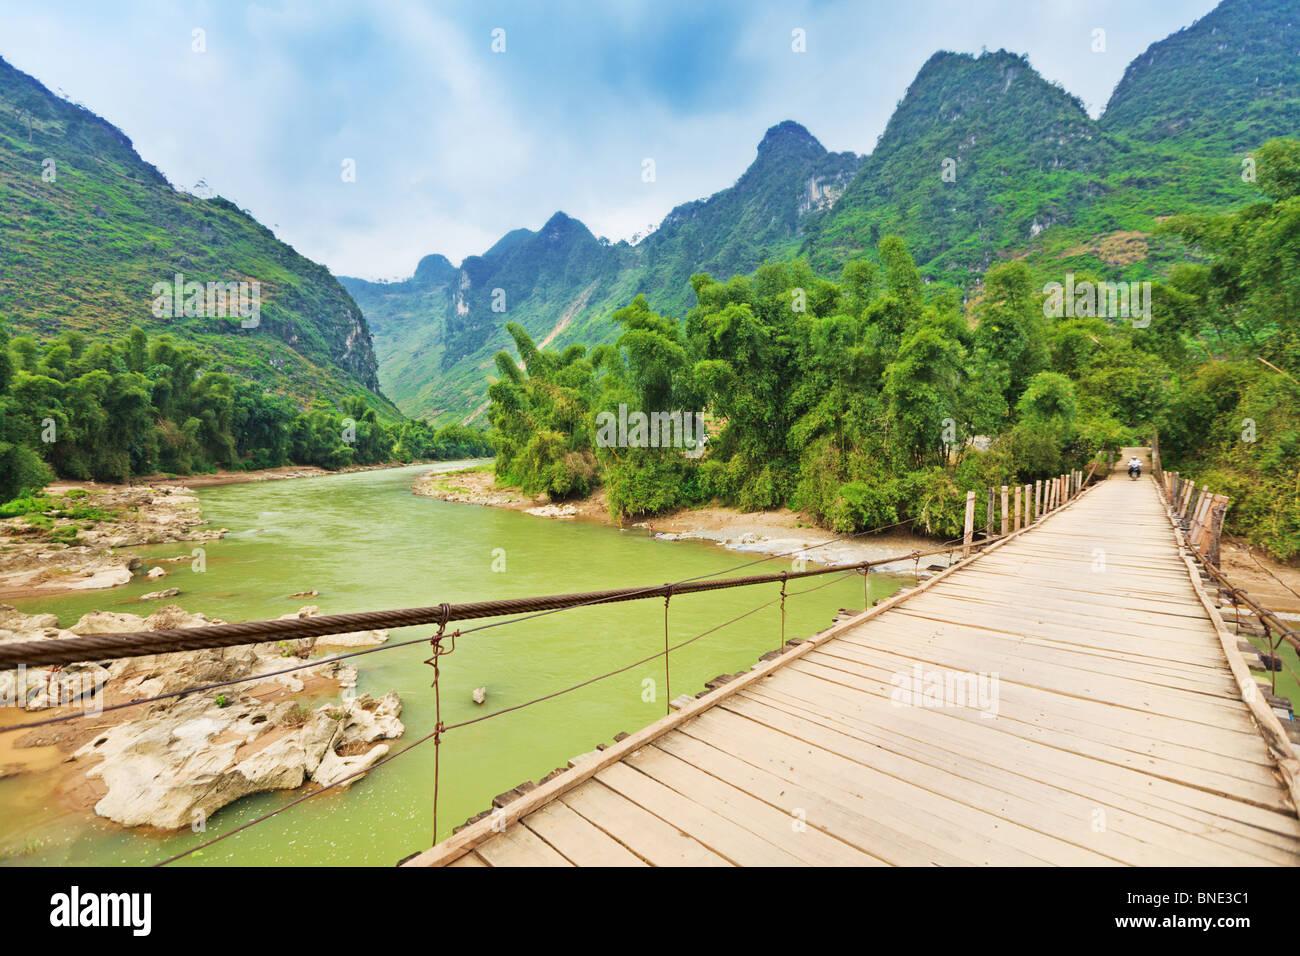 Wooden bridge over mountain river. Northern Vietnam - Stock Image